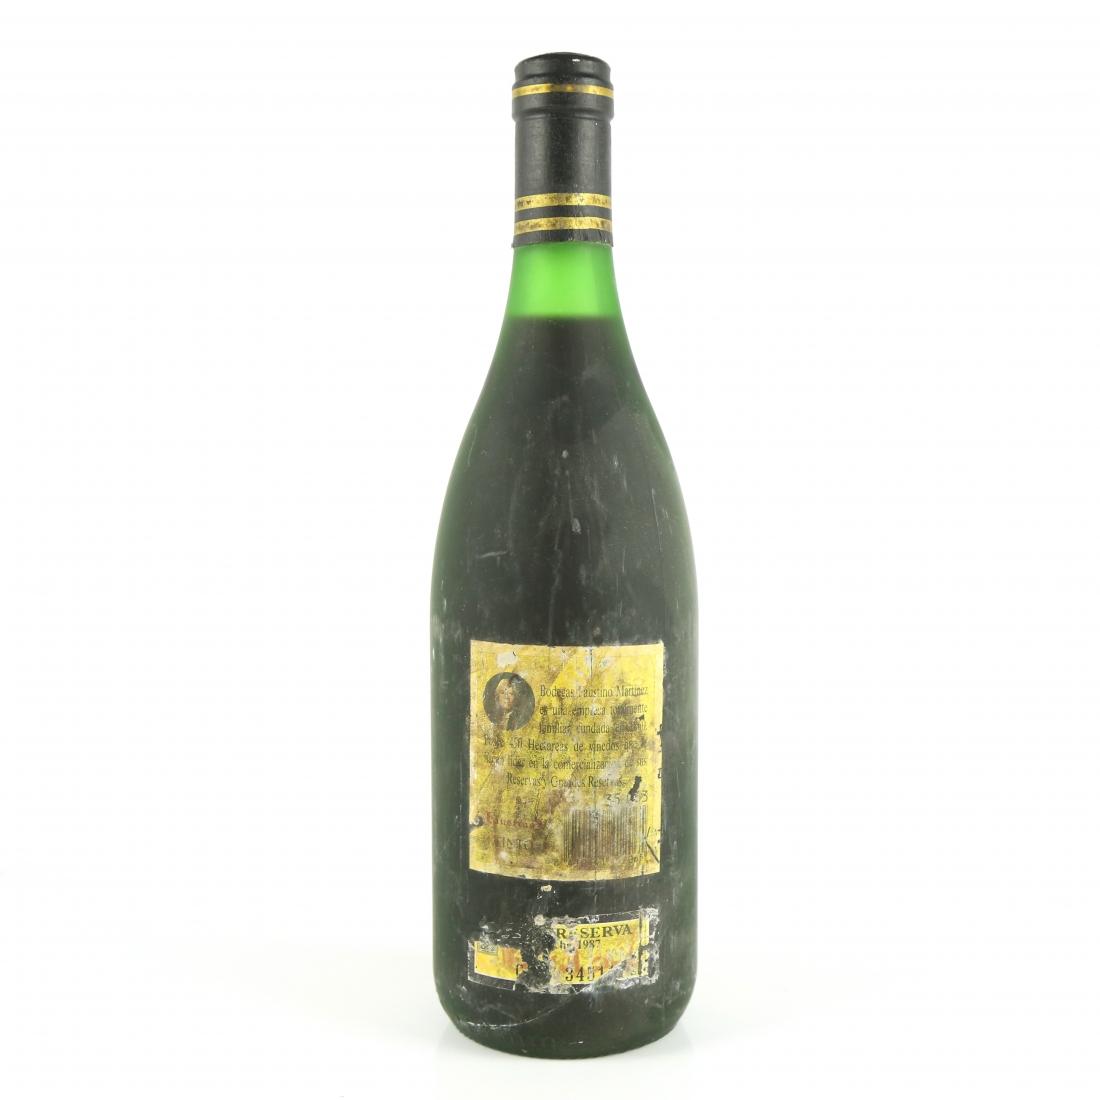 Faustino V 1987 Rioja Reserva